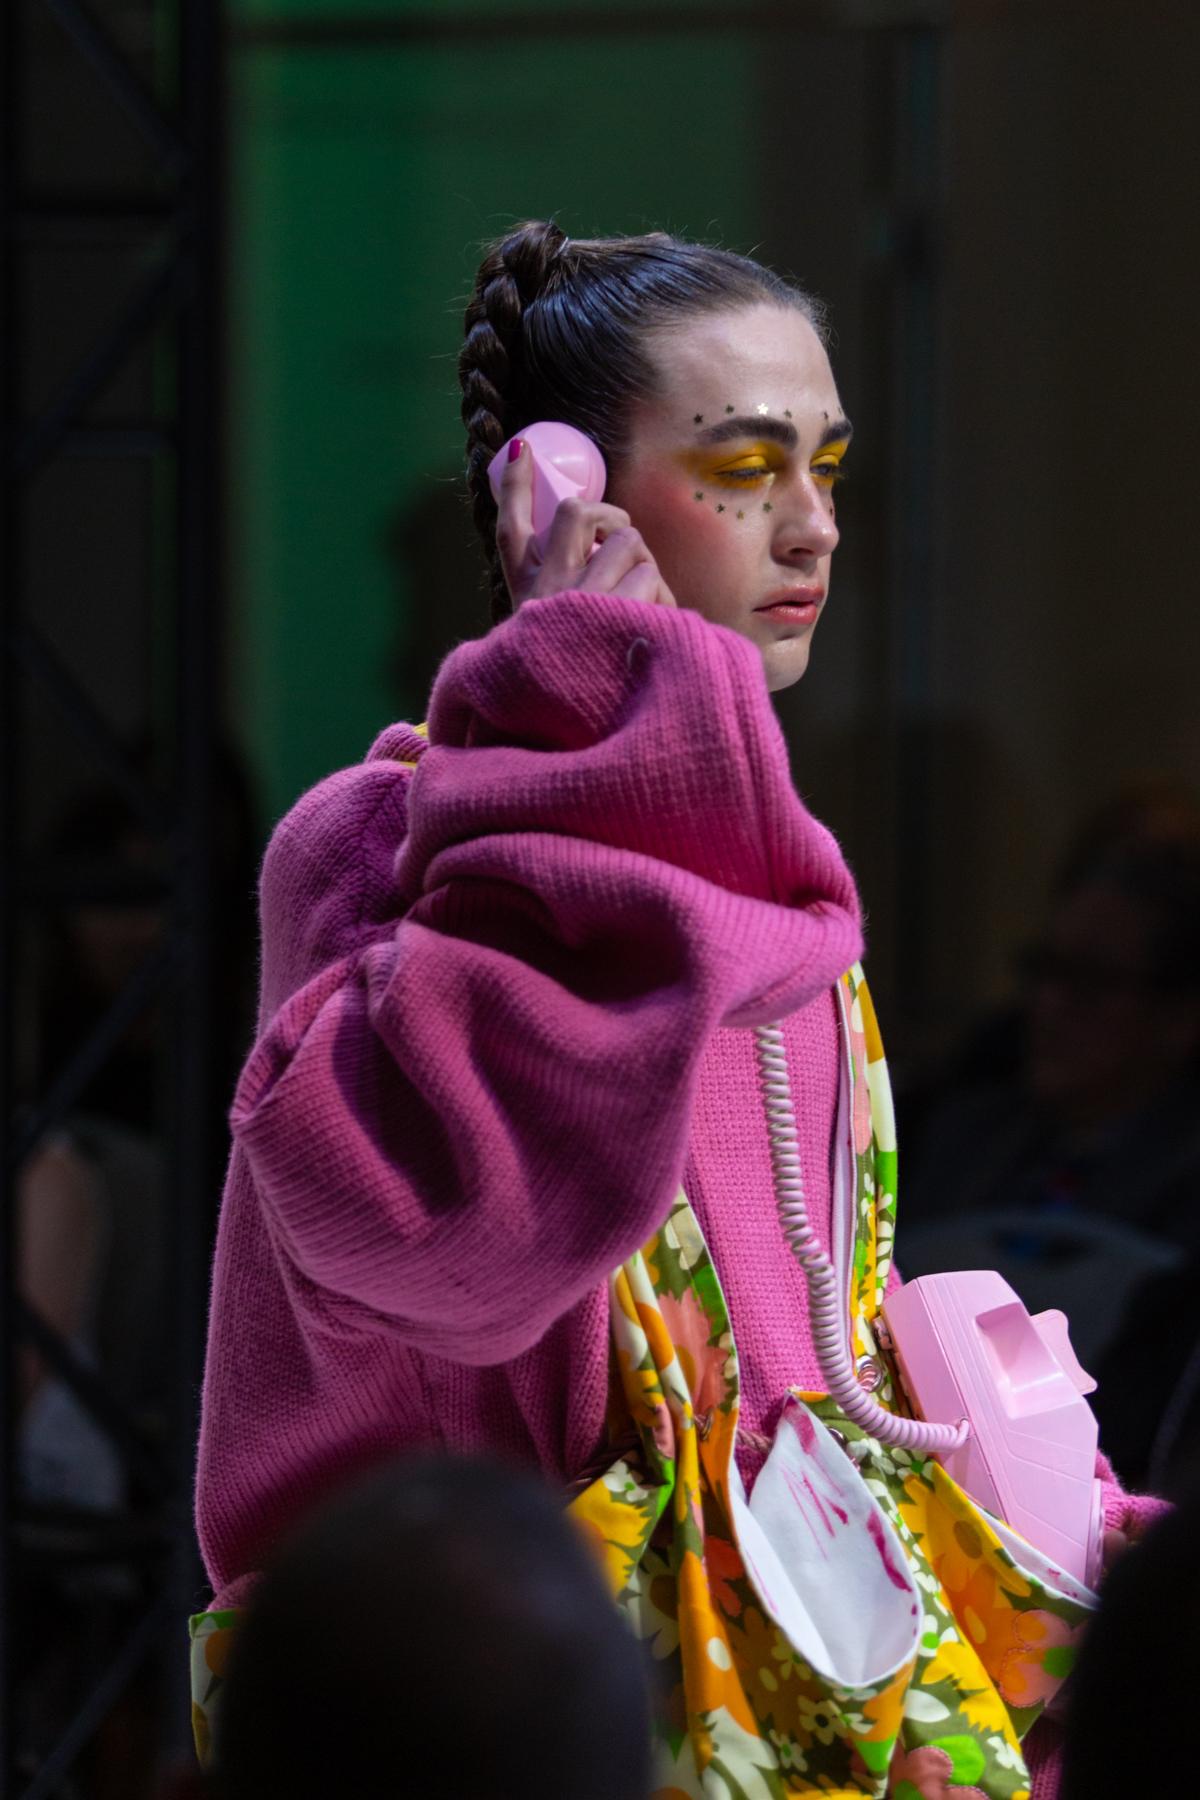 connor_fenwick_saic_fashion_event_03.jpg